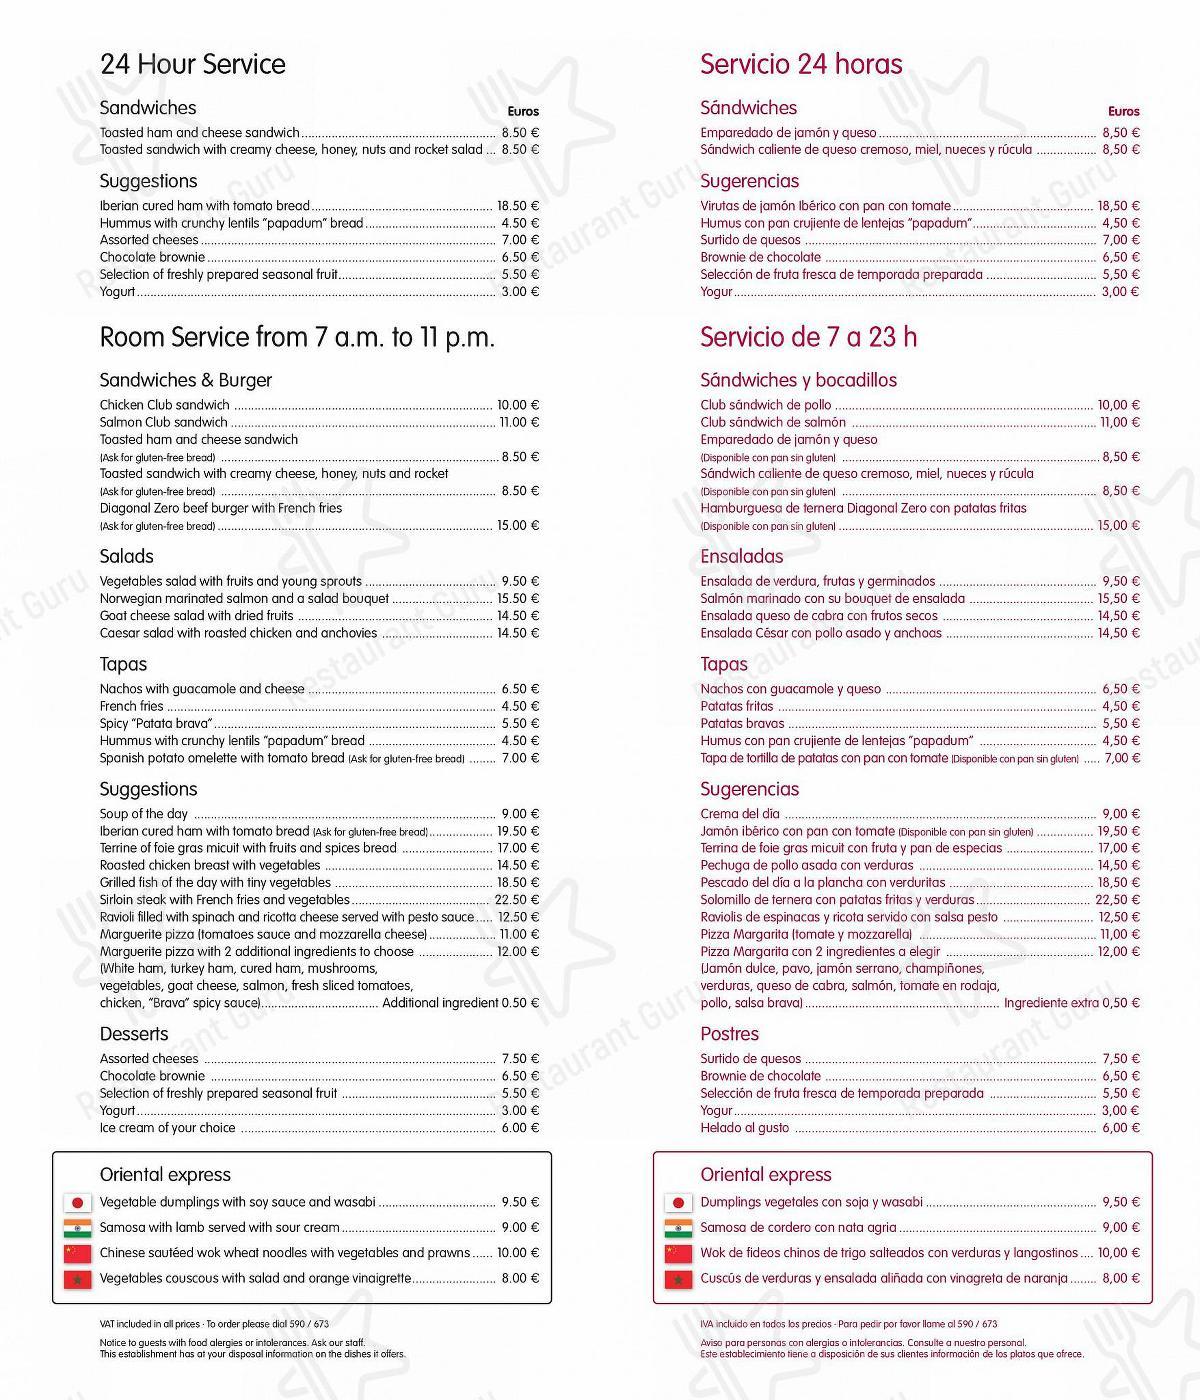 Service Menu for ECHO Restaurant in Barcelona